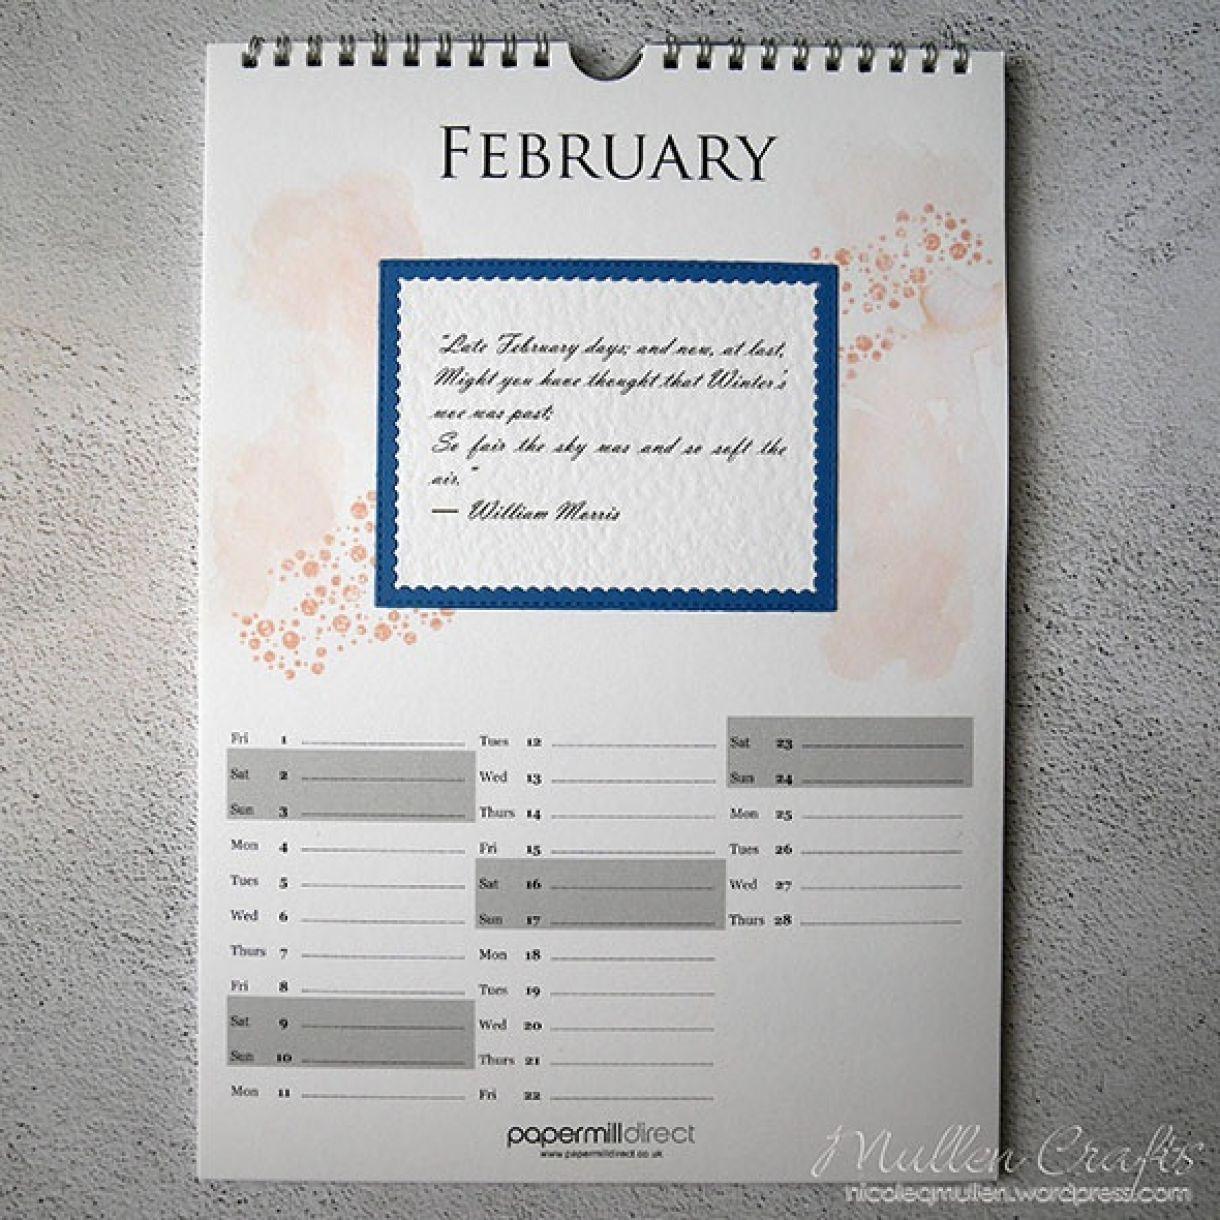 Nicole Calendar Page February1